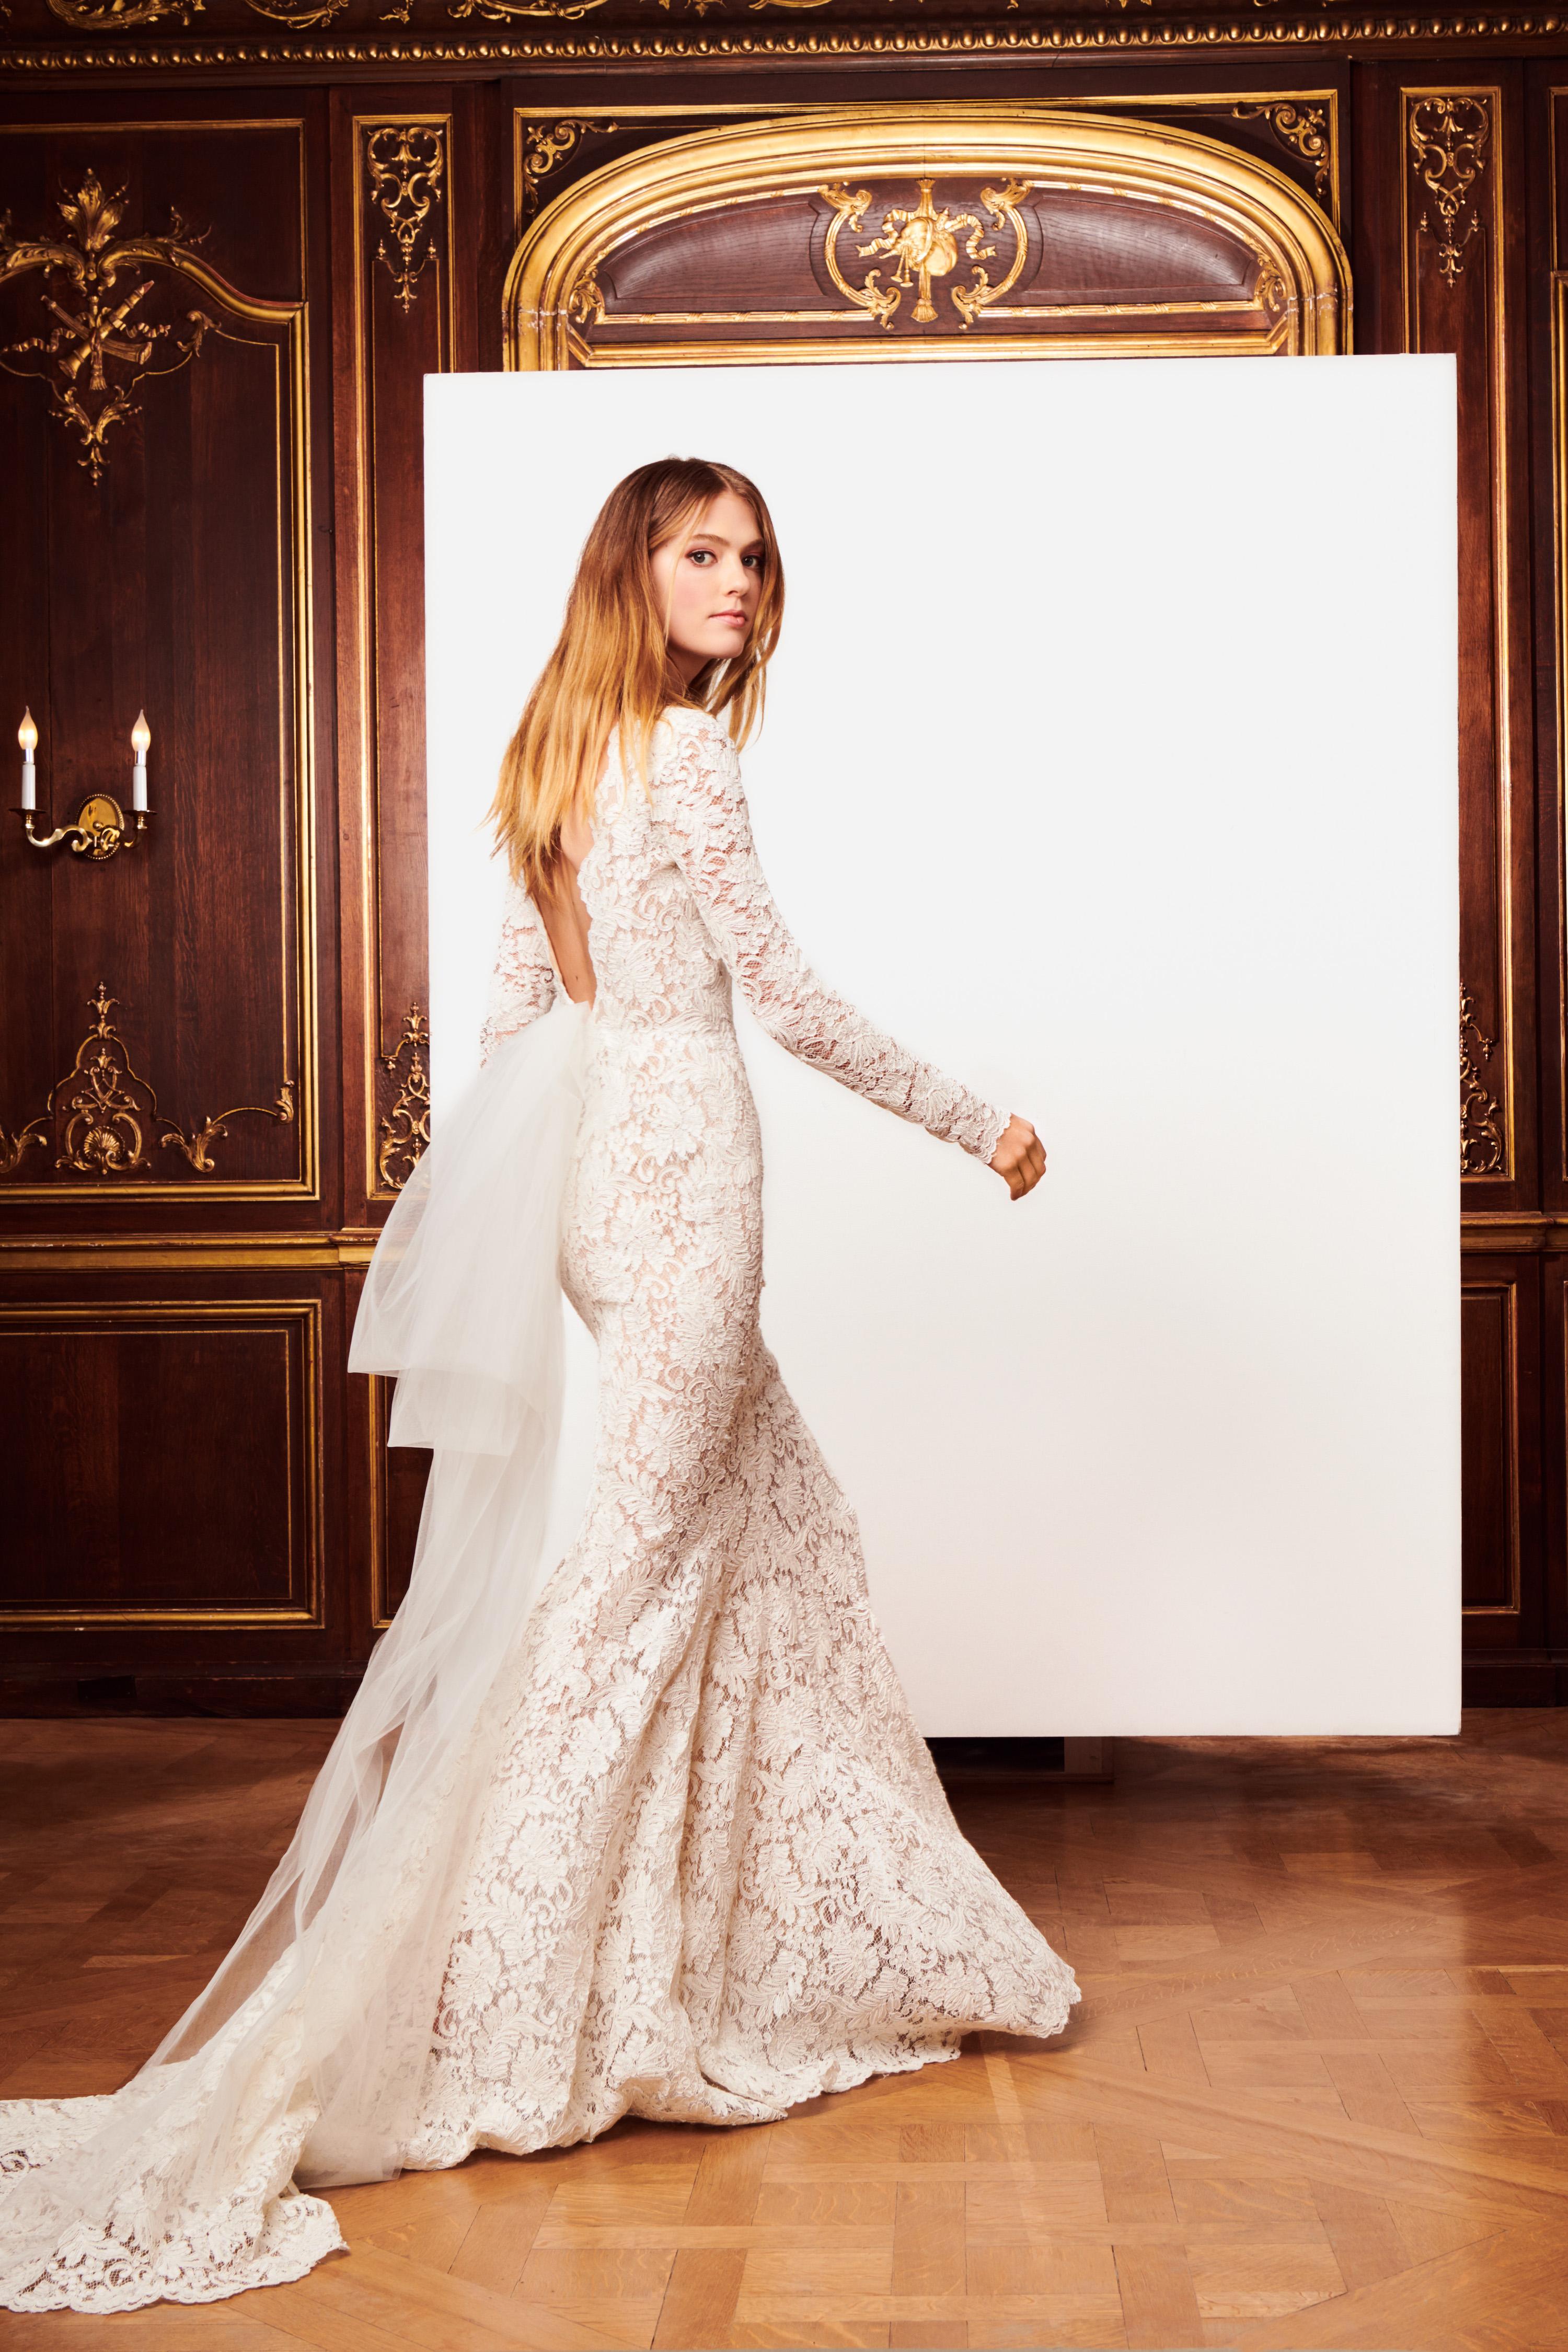 Oscar De La Renta Wedding Dresses.Oscar De La Renta Fall 2018 Wedding Dress Collection